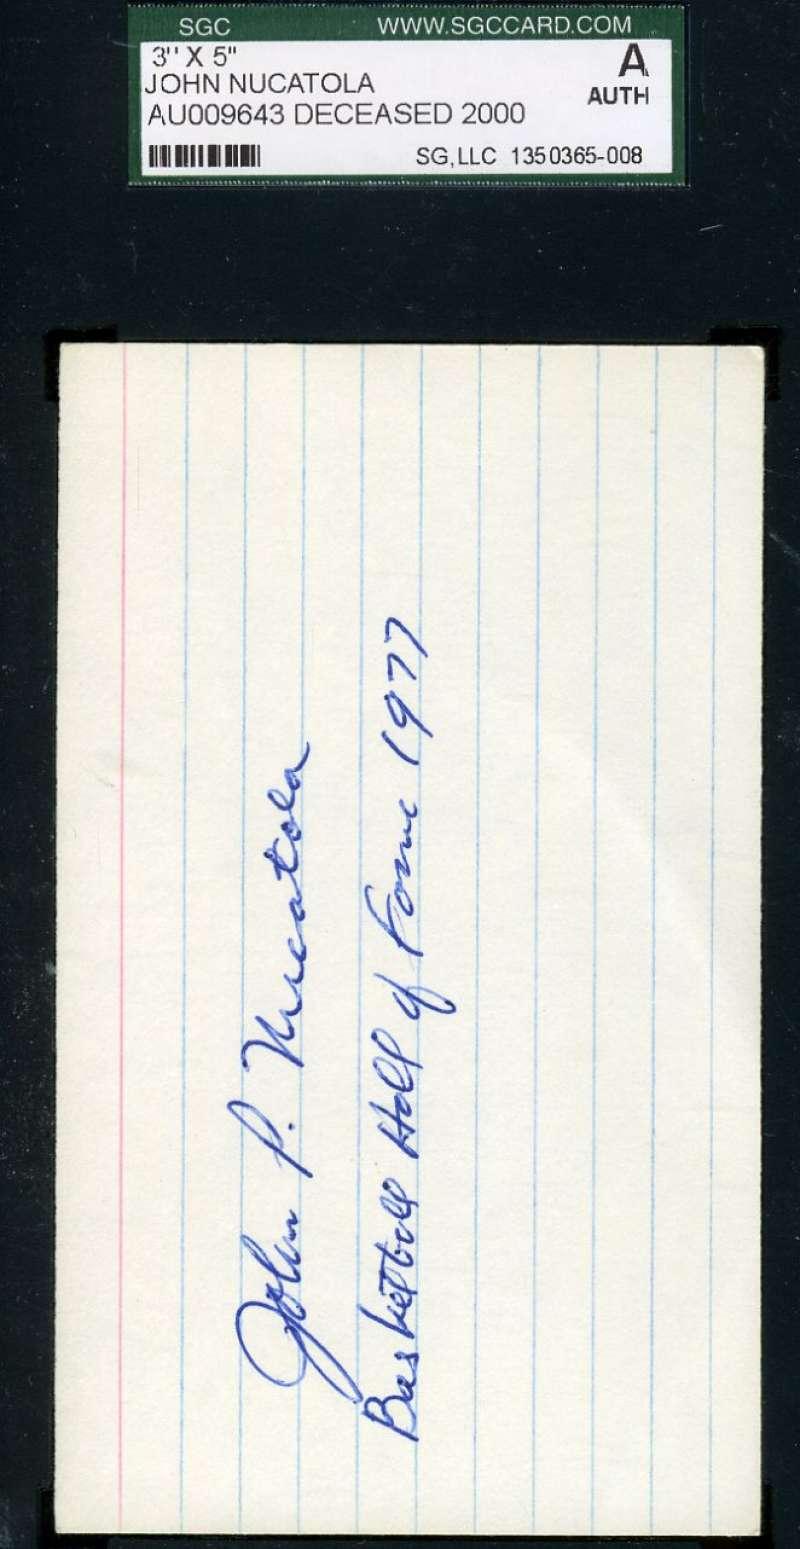 John Nucatola Signed Jsa 3x5 Index Card Hofer Authentic Autograph